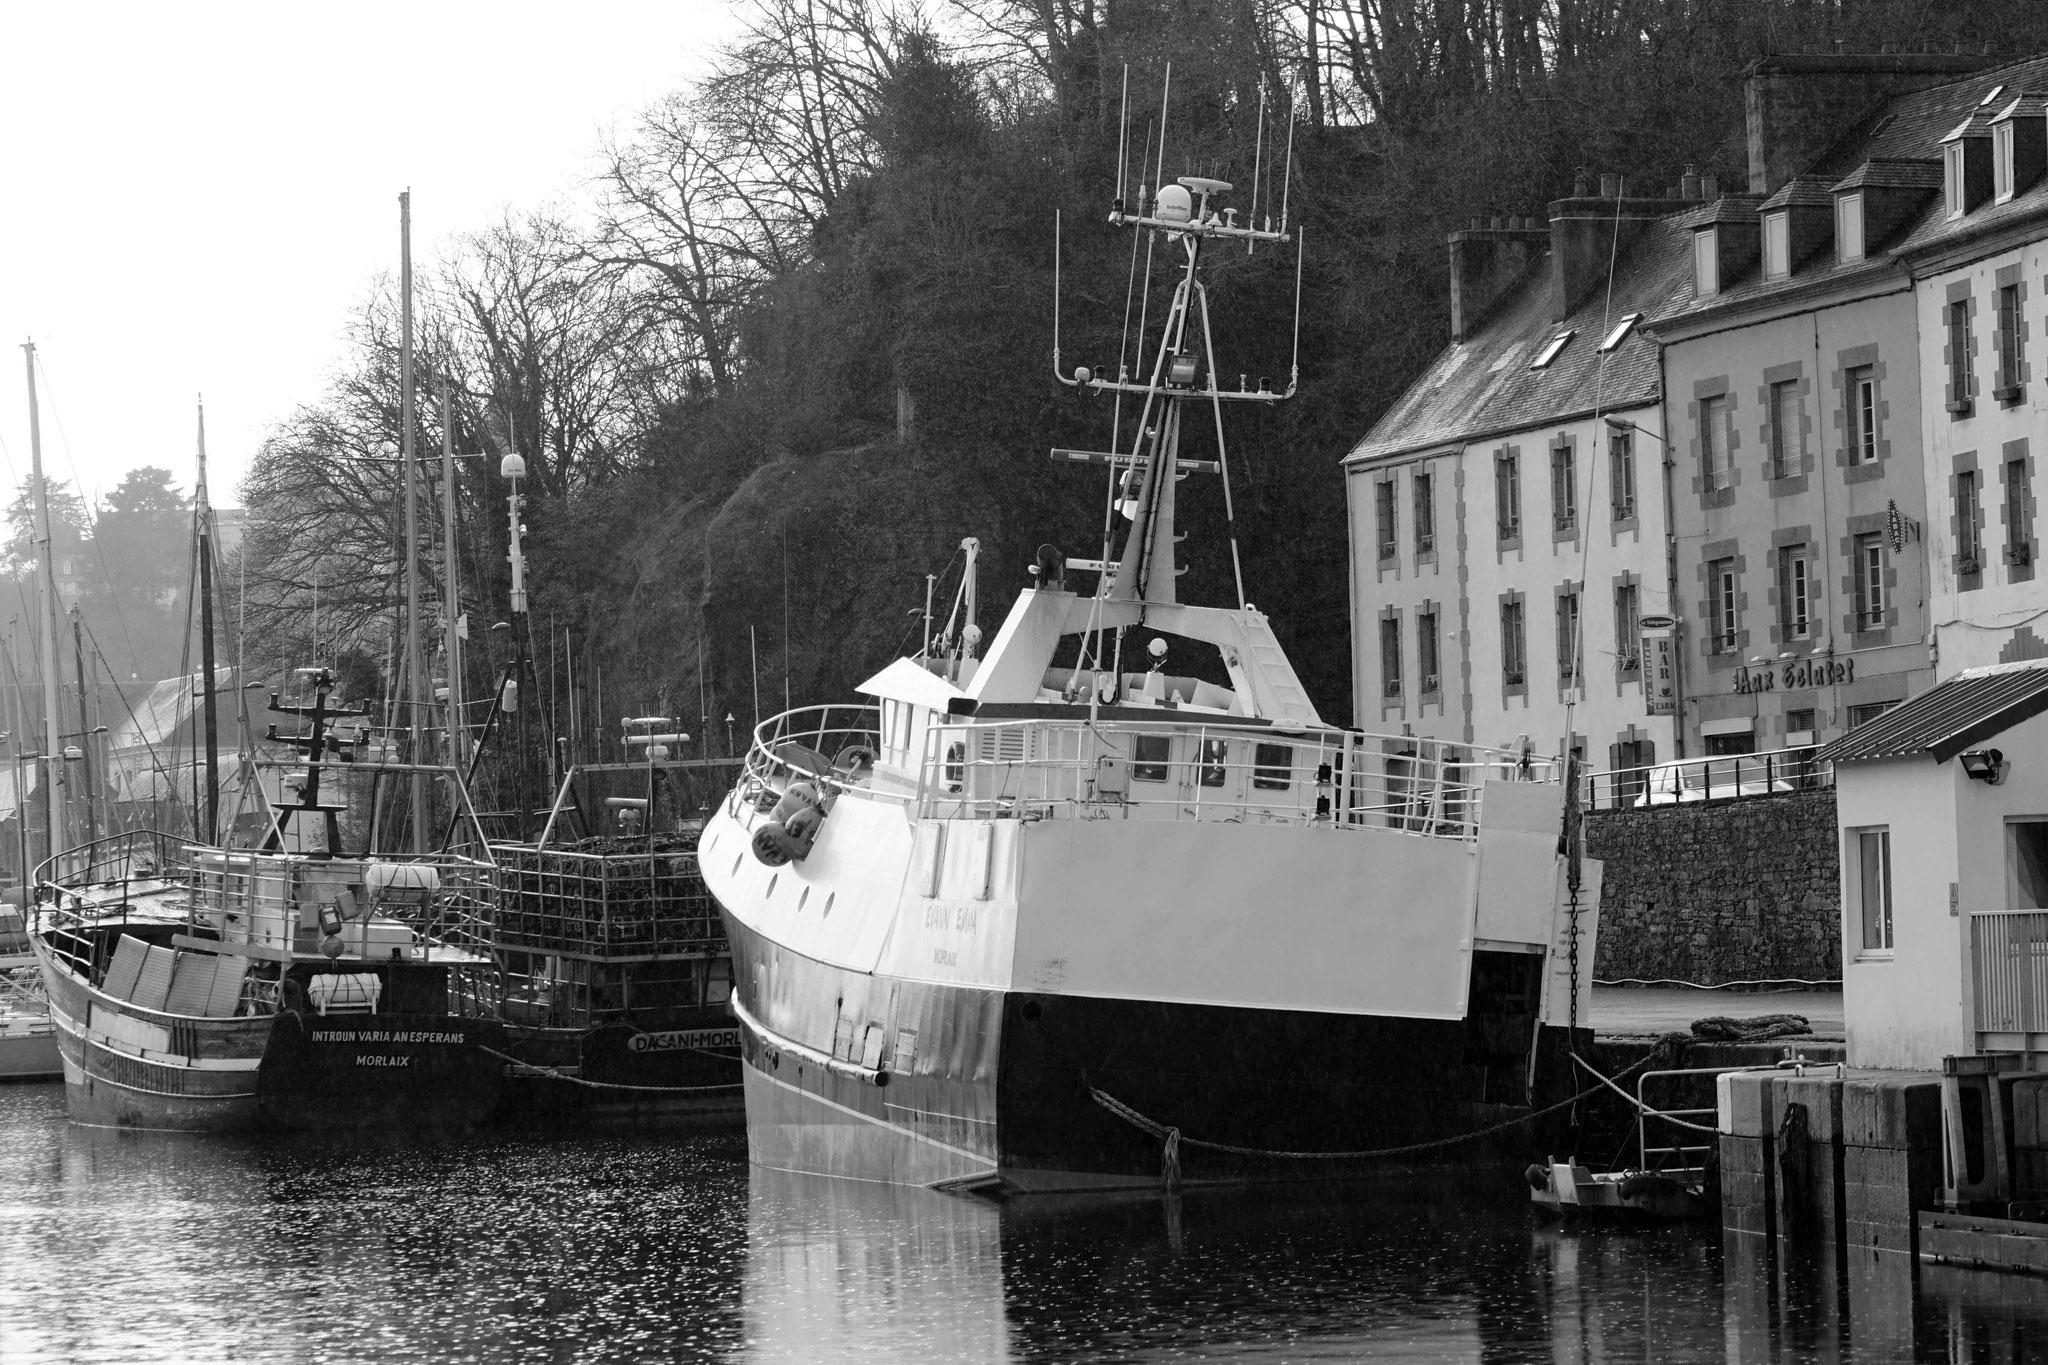 Le Port de pêche de Morlaix, DSC04522